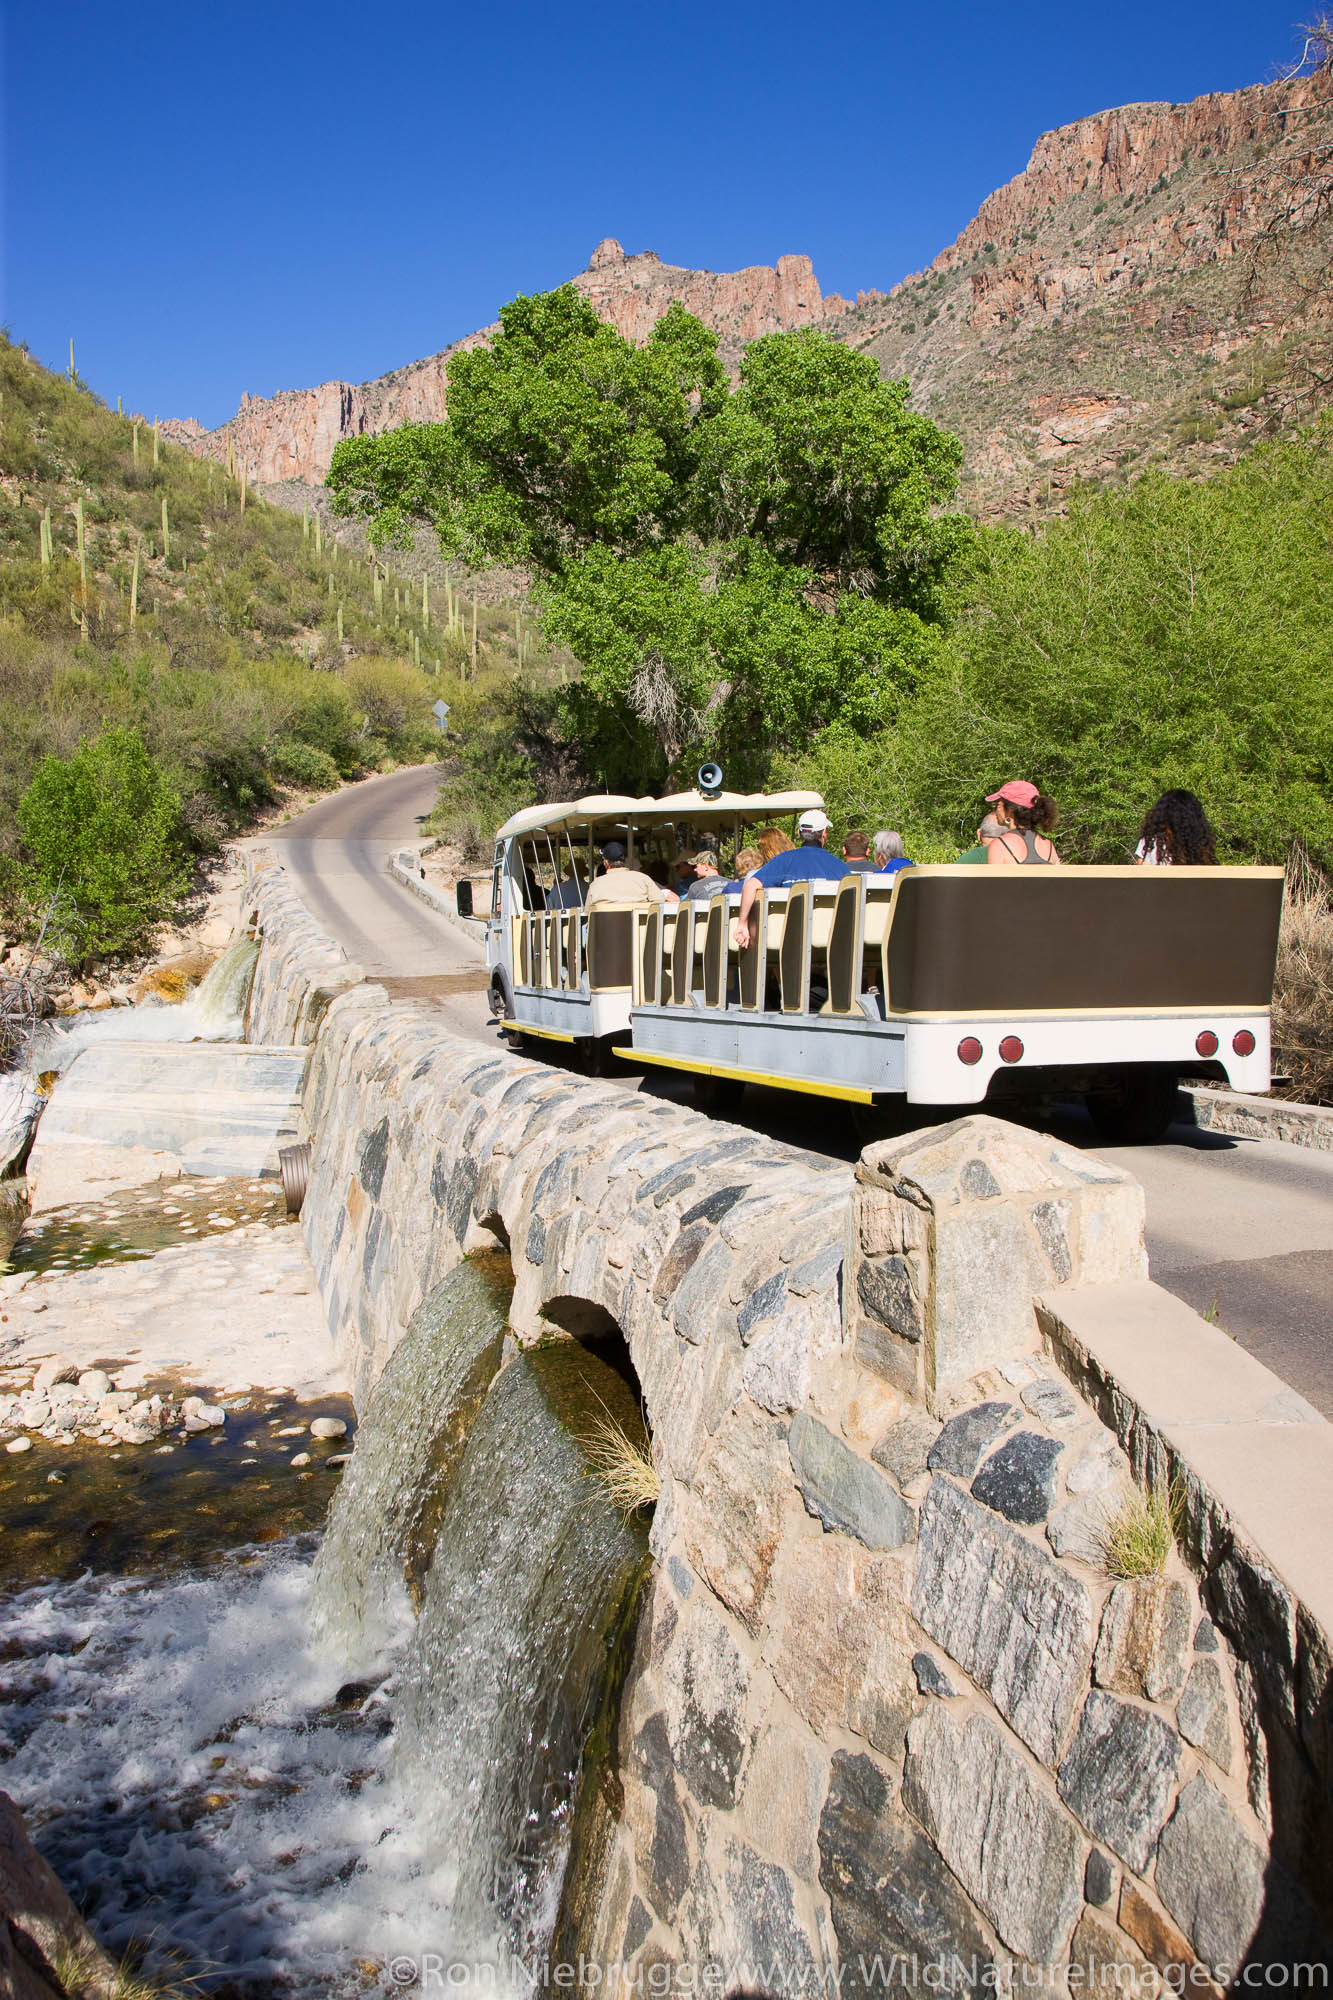 Shuttle crosses Sabino Creek, Sabino Canyon Recreation Area, Tucson, Arizona.